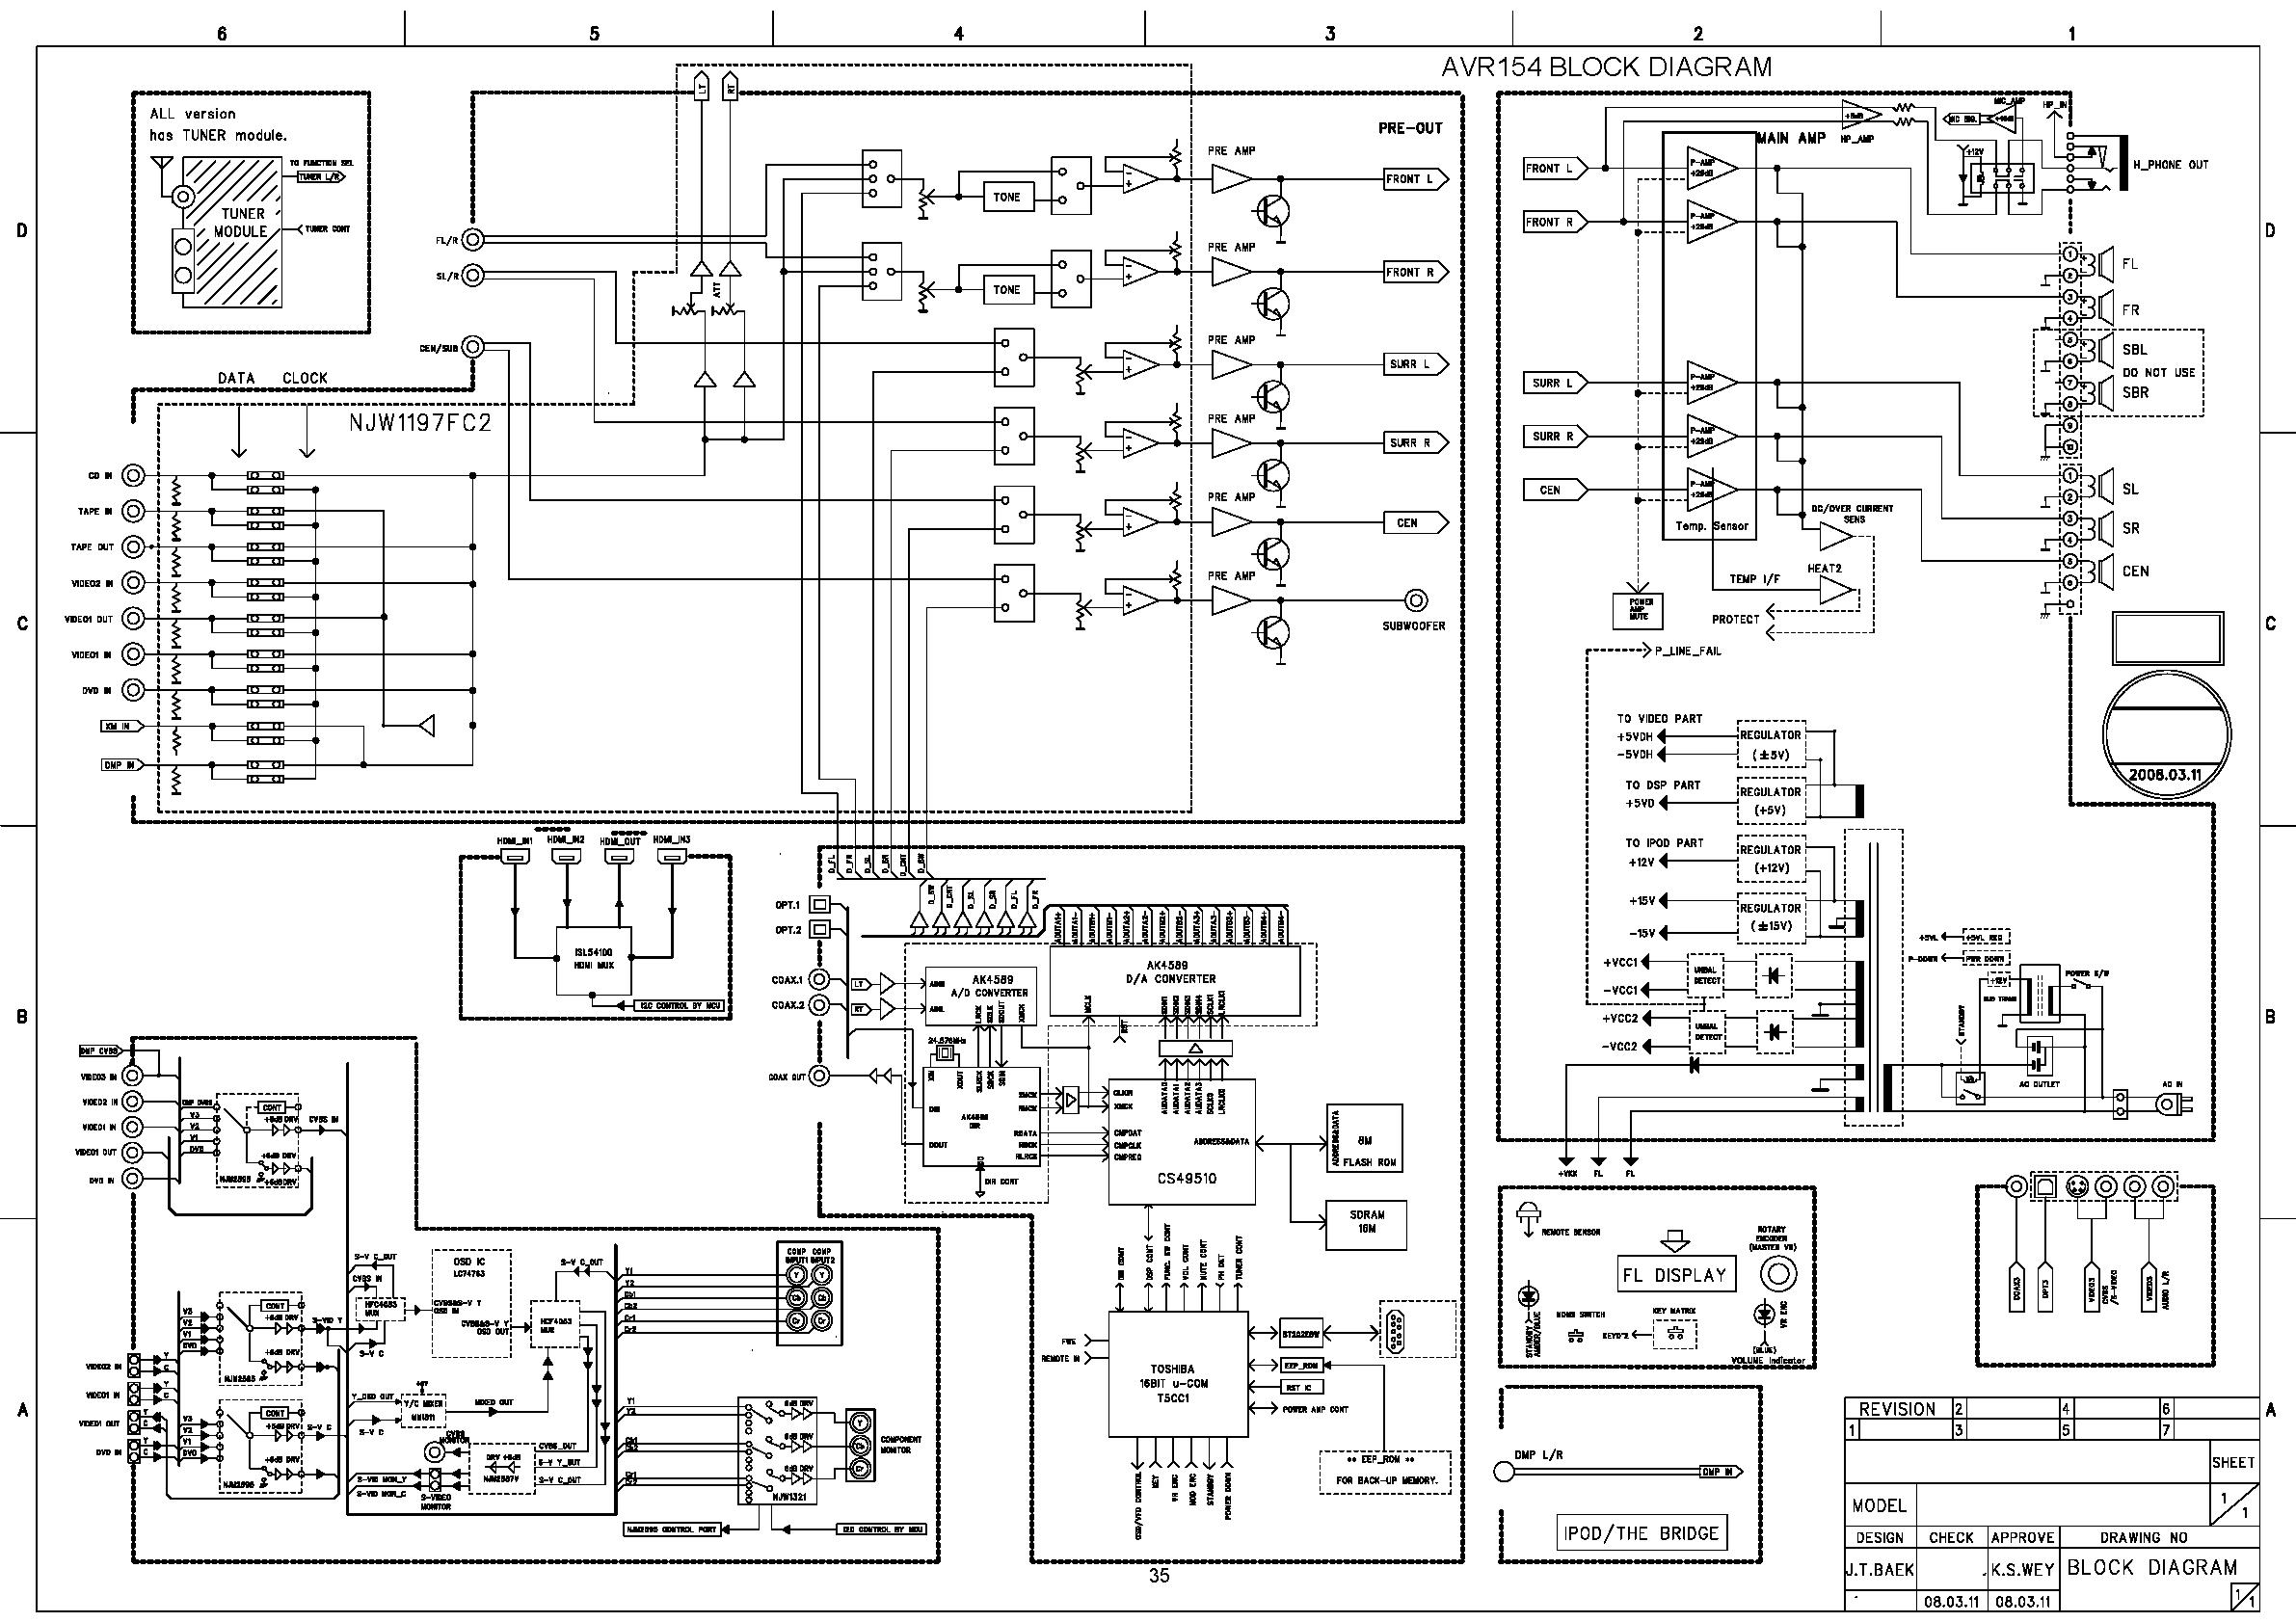 2007 isuzu nqr wiring diagram html